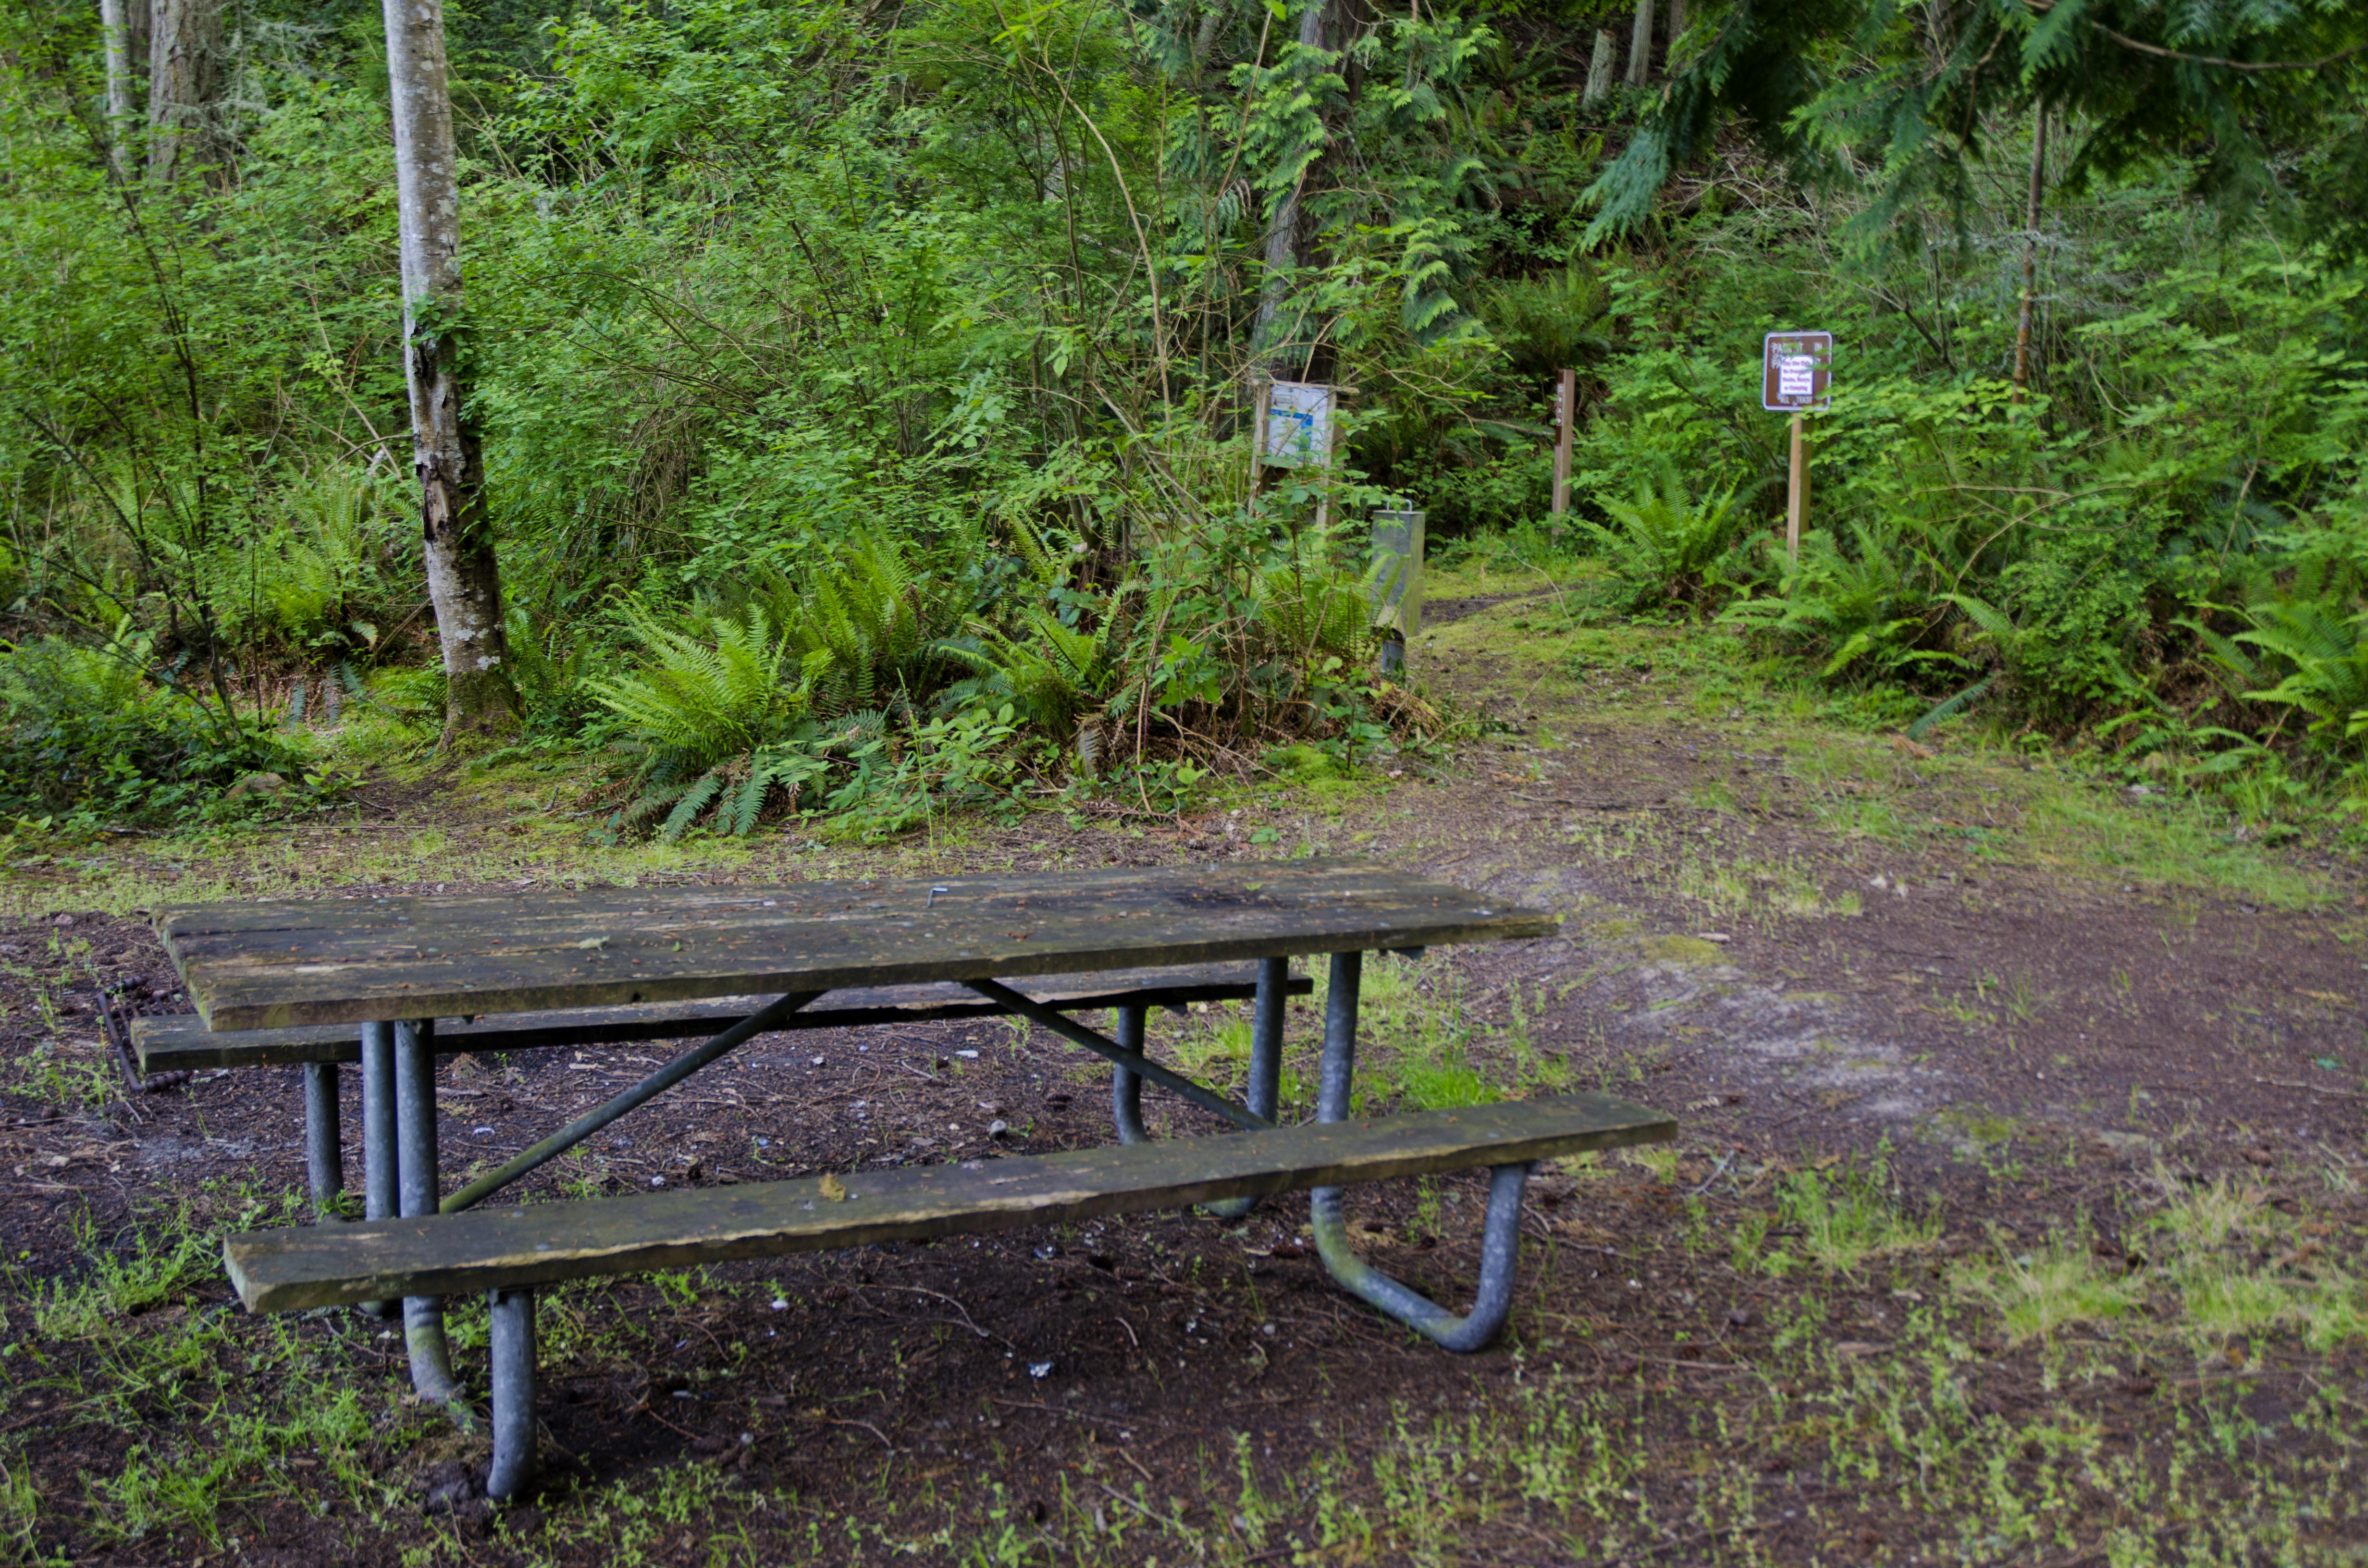 Picnic Table Burrows